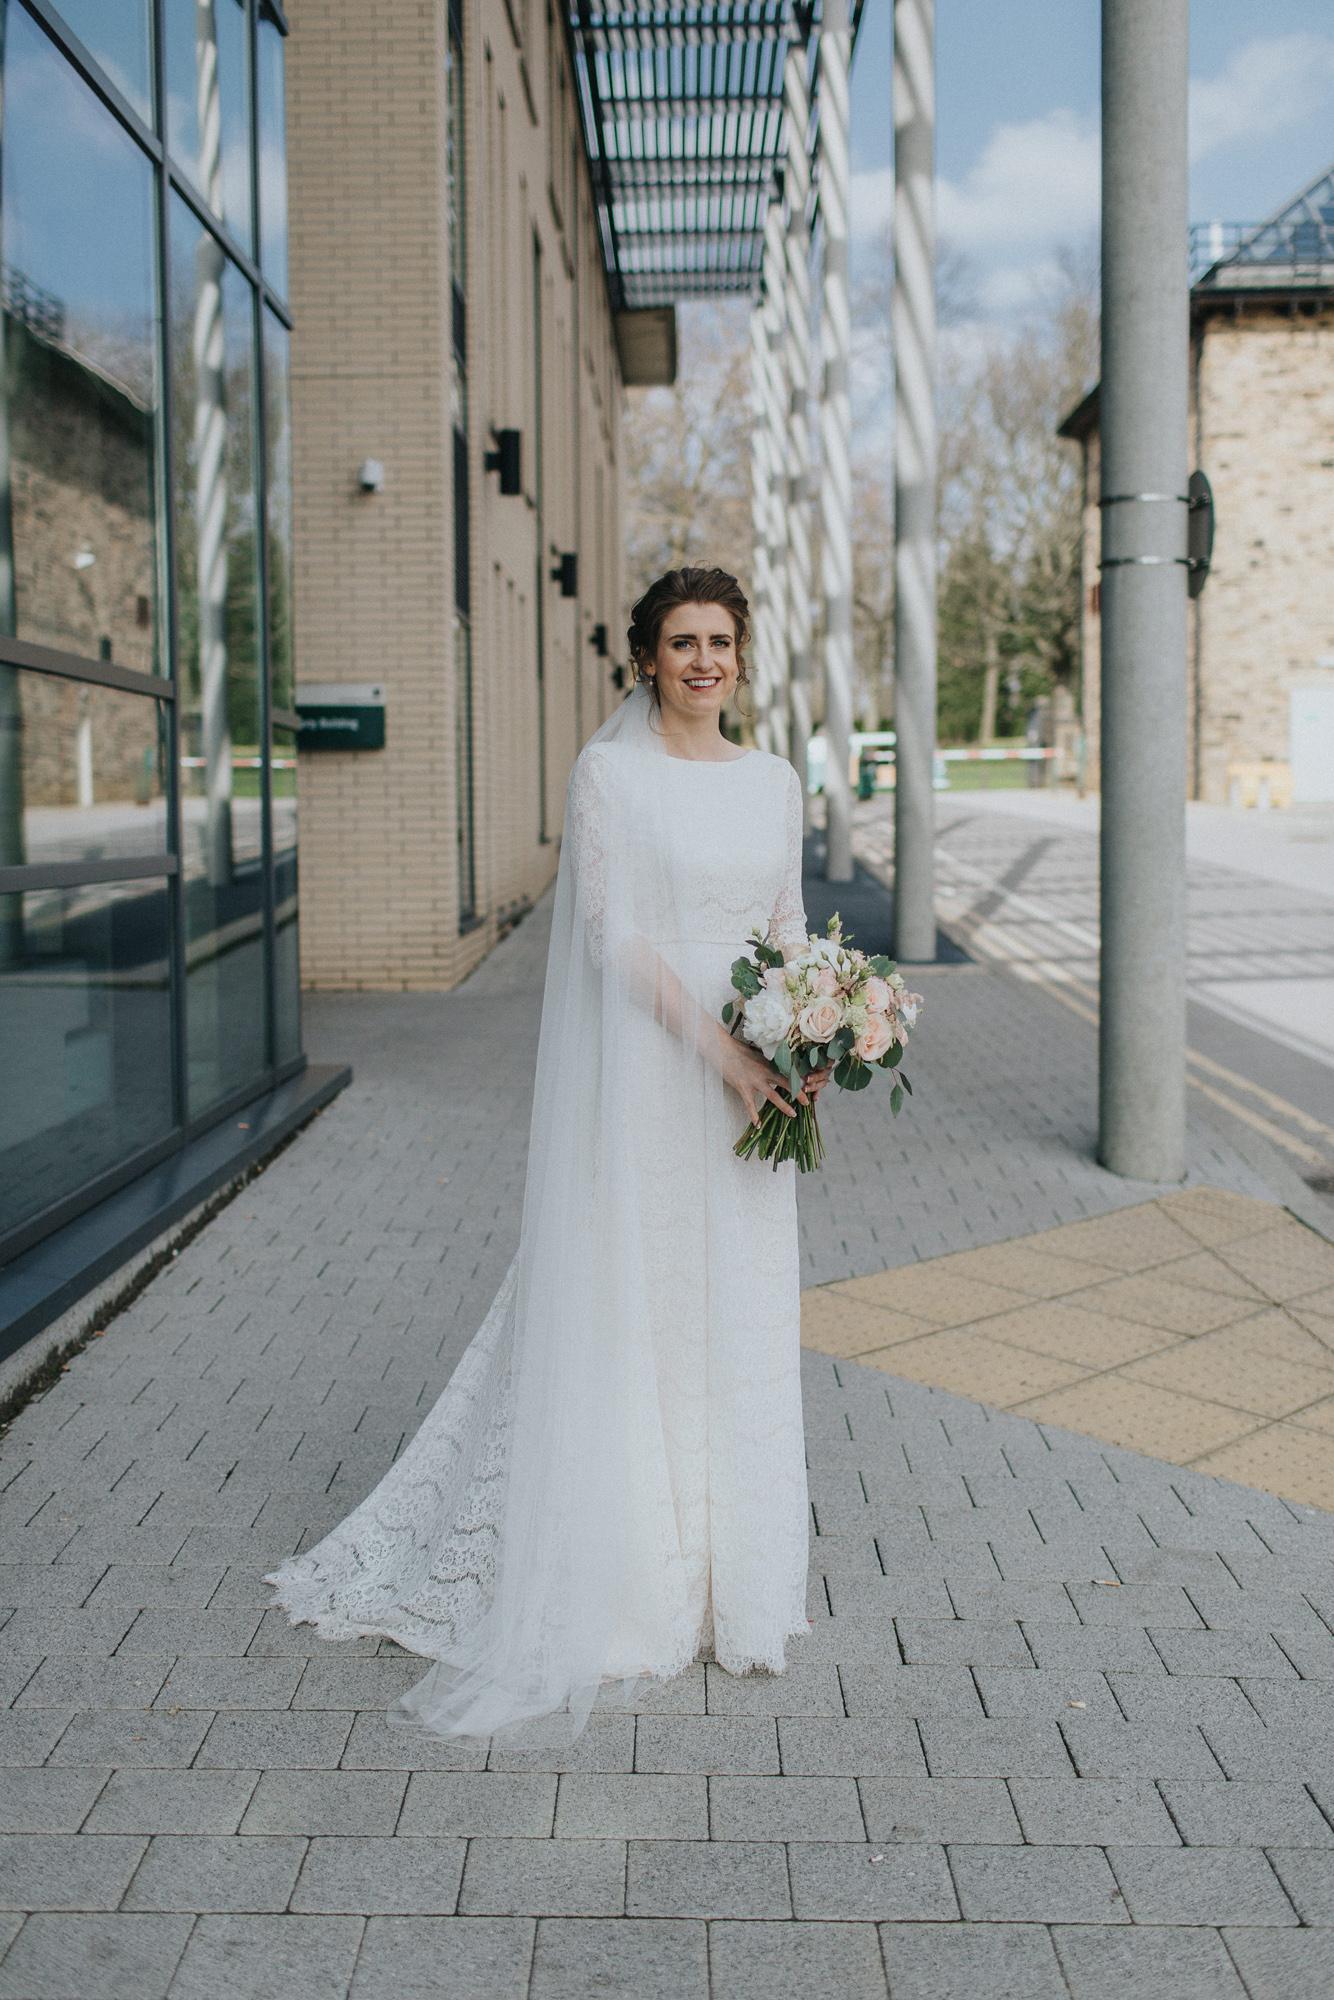 Kate-Beaumont-Lace-Flared-Dahlia-Gown-Leeds-Wedding-Bloom-Weddings-41.jpg